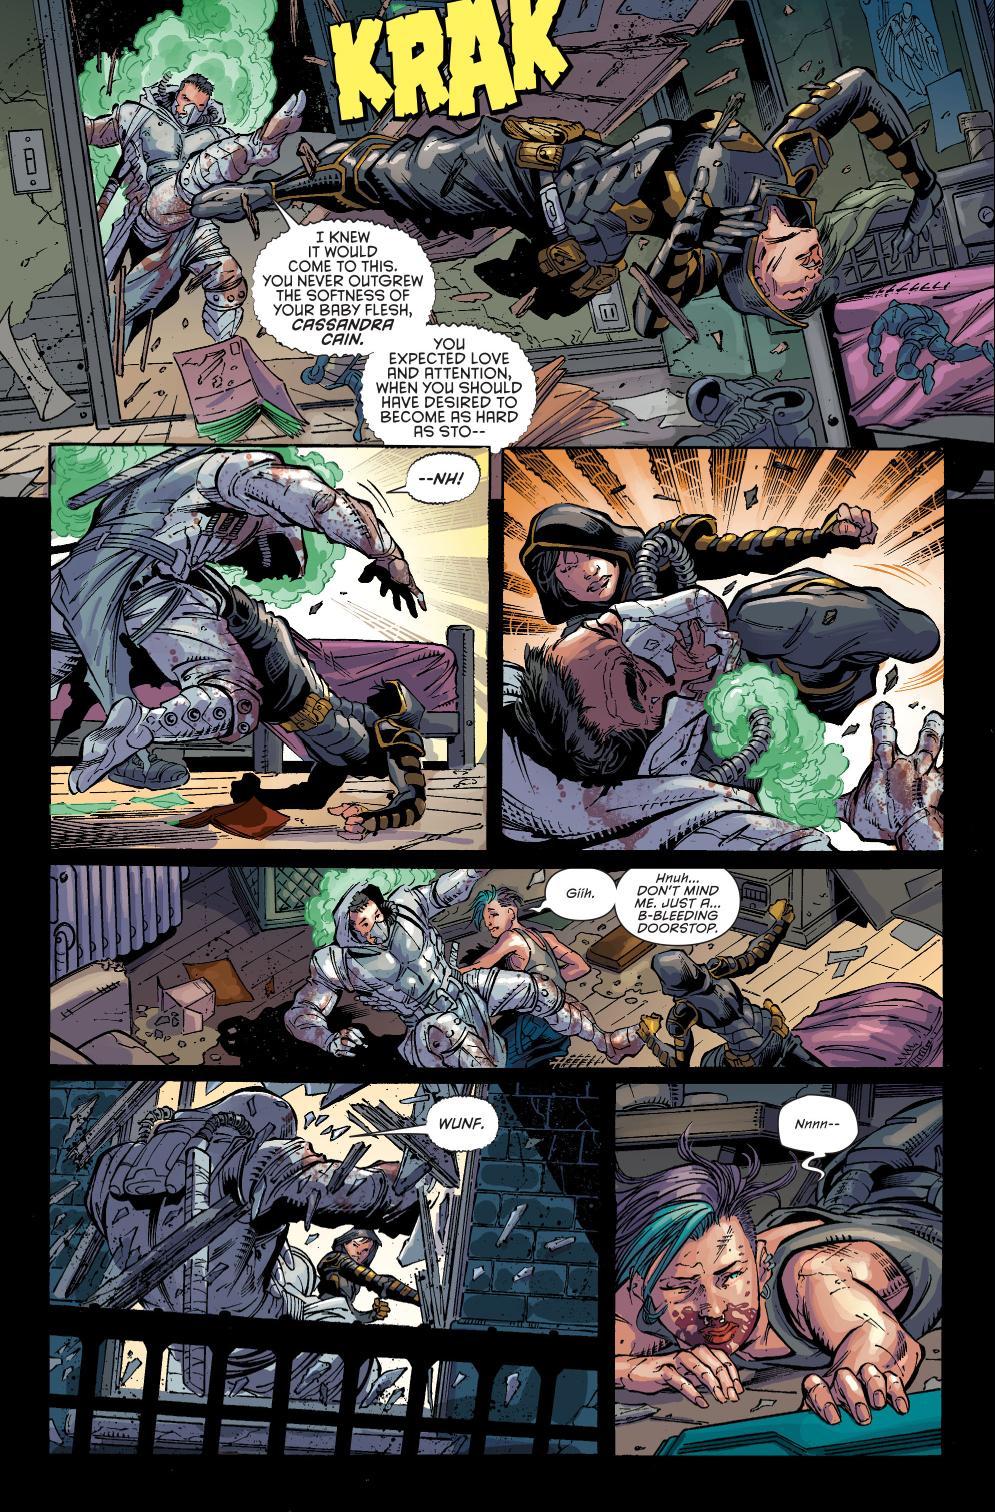 Cassandra Cain VS The Orphan Comicnewbies